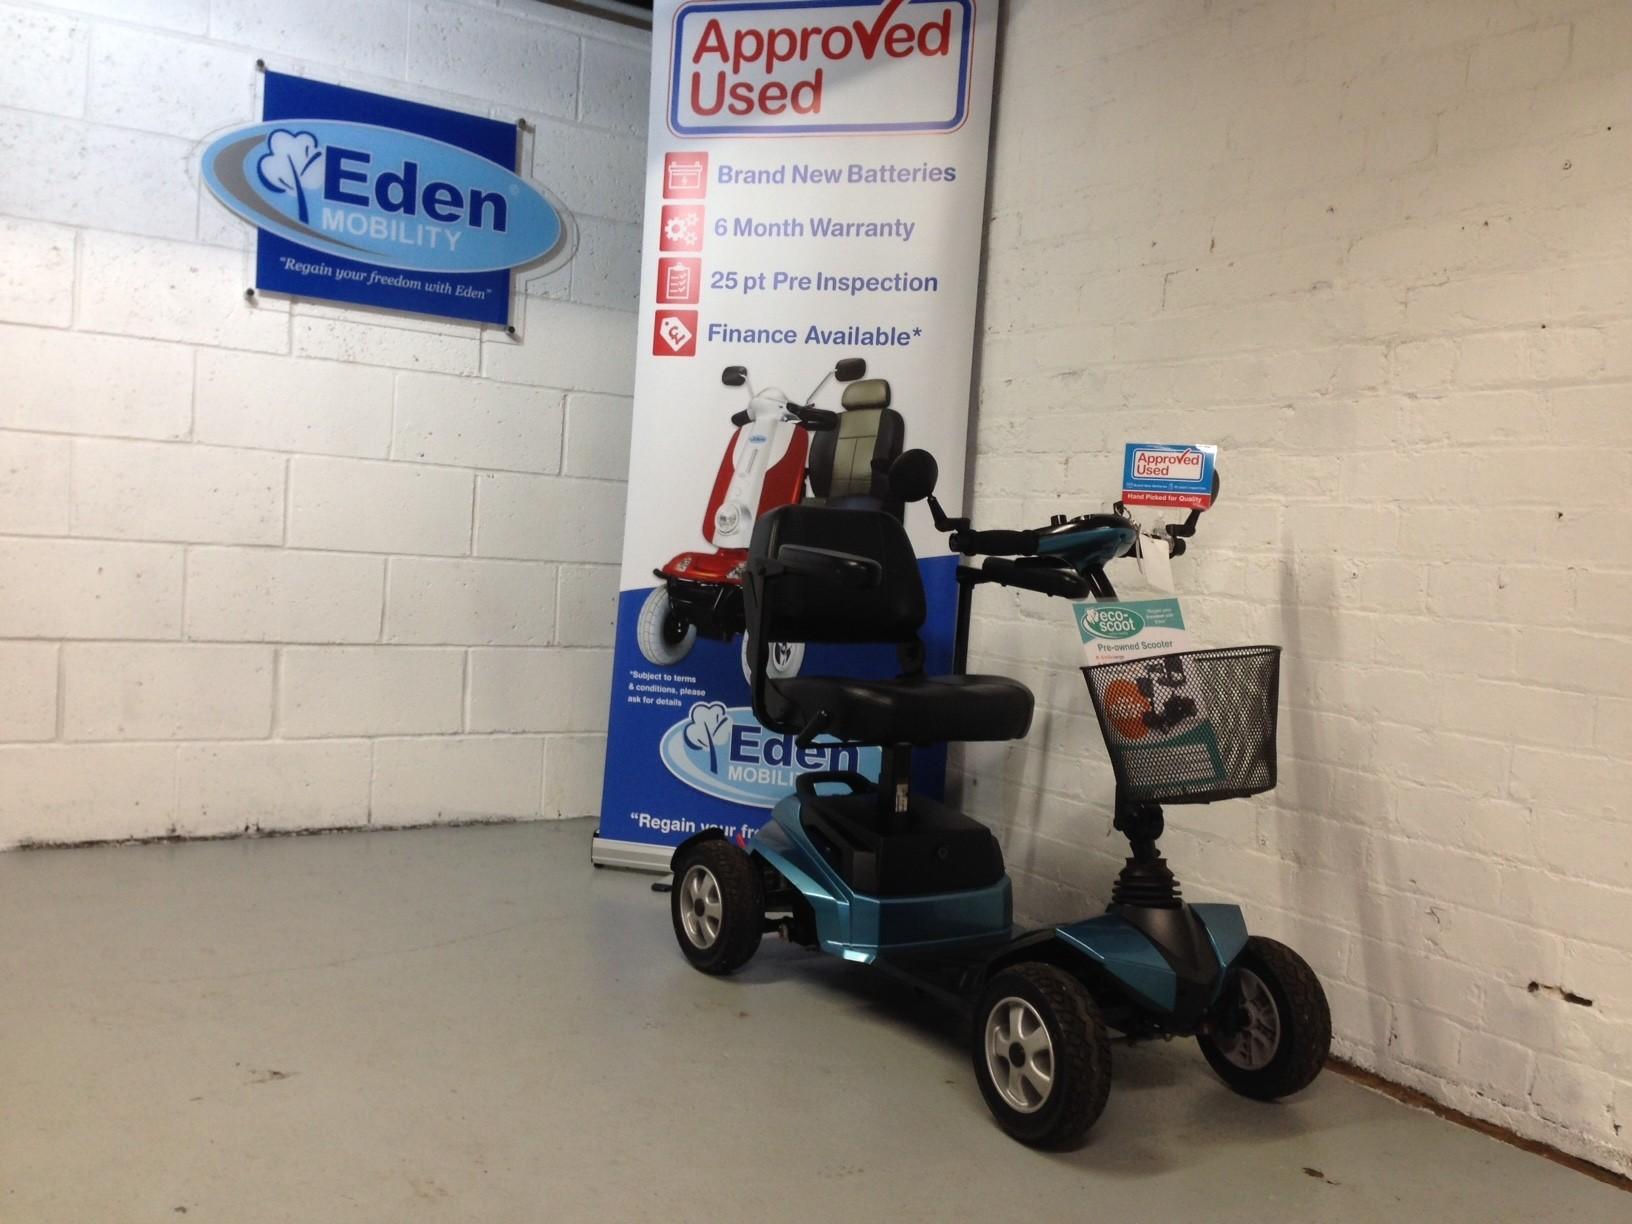 Eden Eco Boot Teal